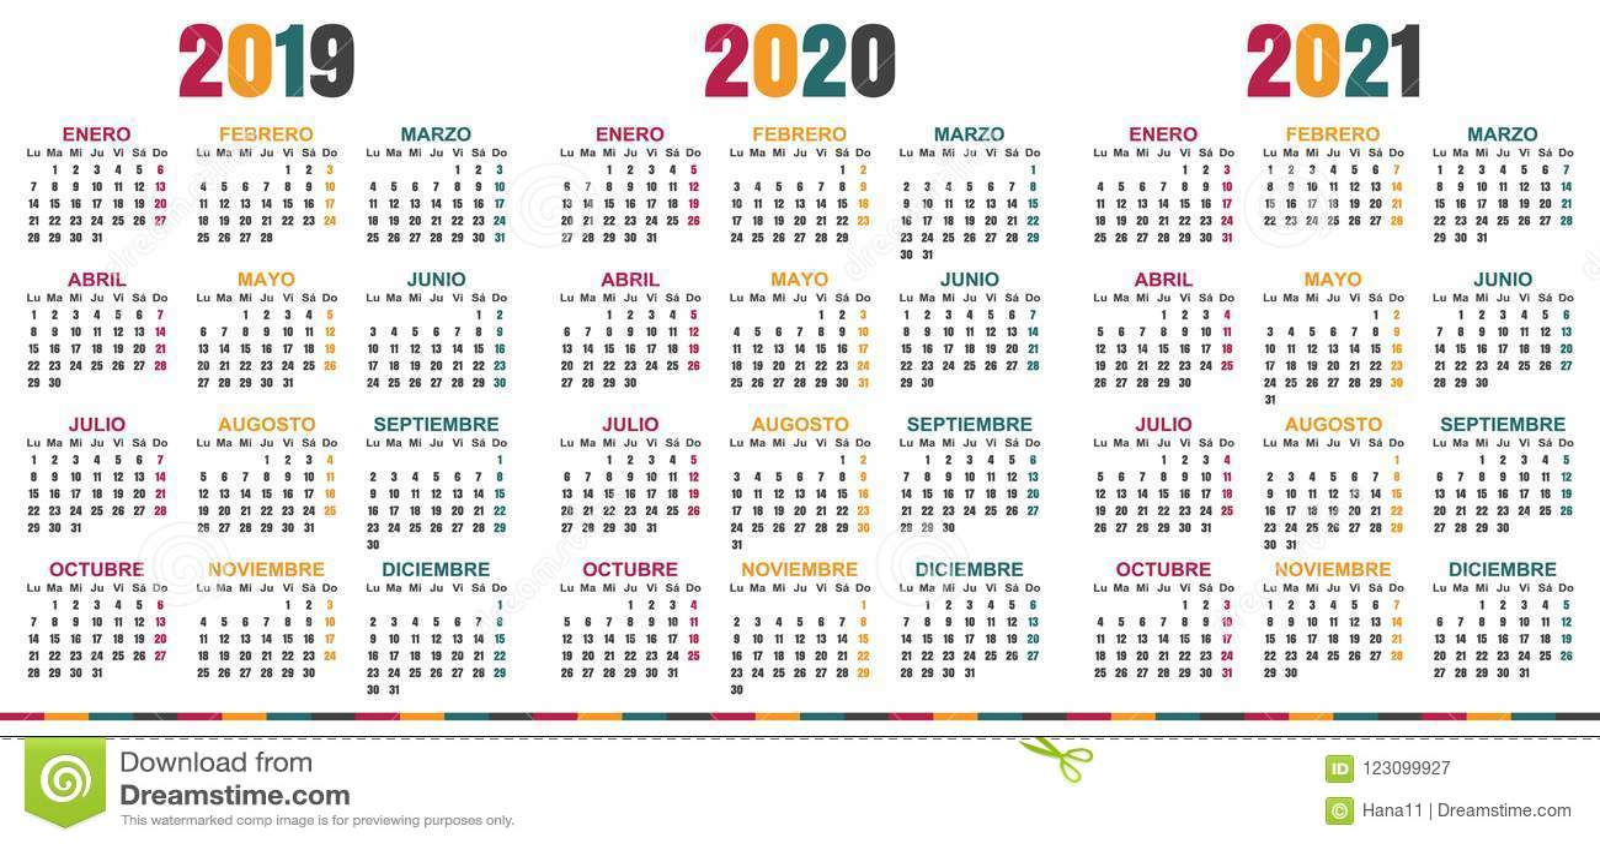 Calendrier Espagnol 2021 Calendrier Espagnol 2019 2021 Illustration de Vecteur